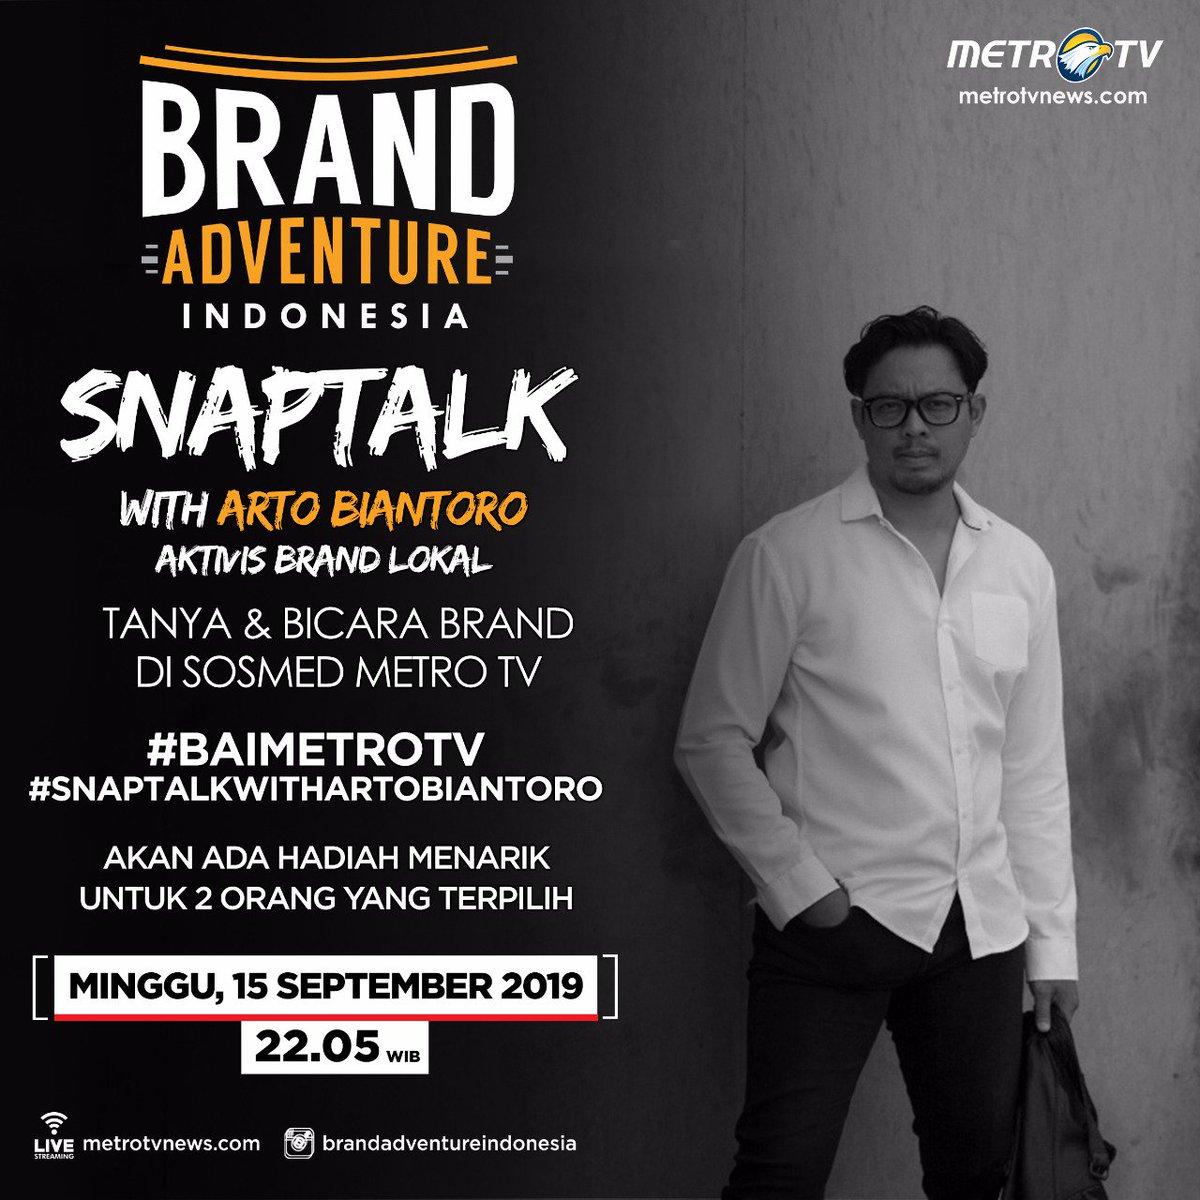 "Hallo, People! Kamu bisa tanya apa saja seputar brand di #SnaptalkWithArtoBiantoro. Kirim pertanyaanmu ke sosmed #MetroTV dengan tagar #BAIMetroTV dan #SnaptalkWithArtoBiantoro ya.Tonton juga #BrandAdventureIndonesia ""Spesifik Market"" Minggu (15/9) pkl 22.05 WIB ya!"